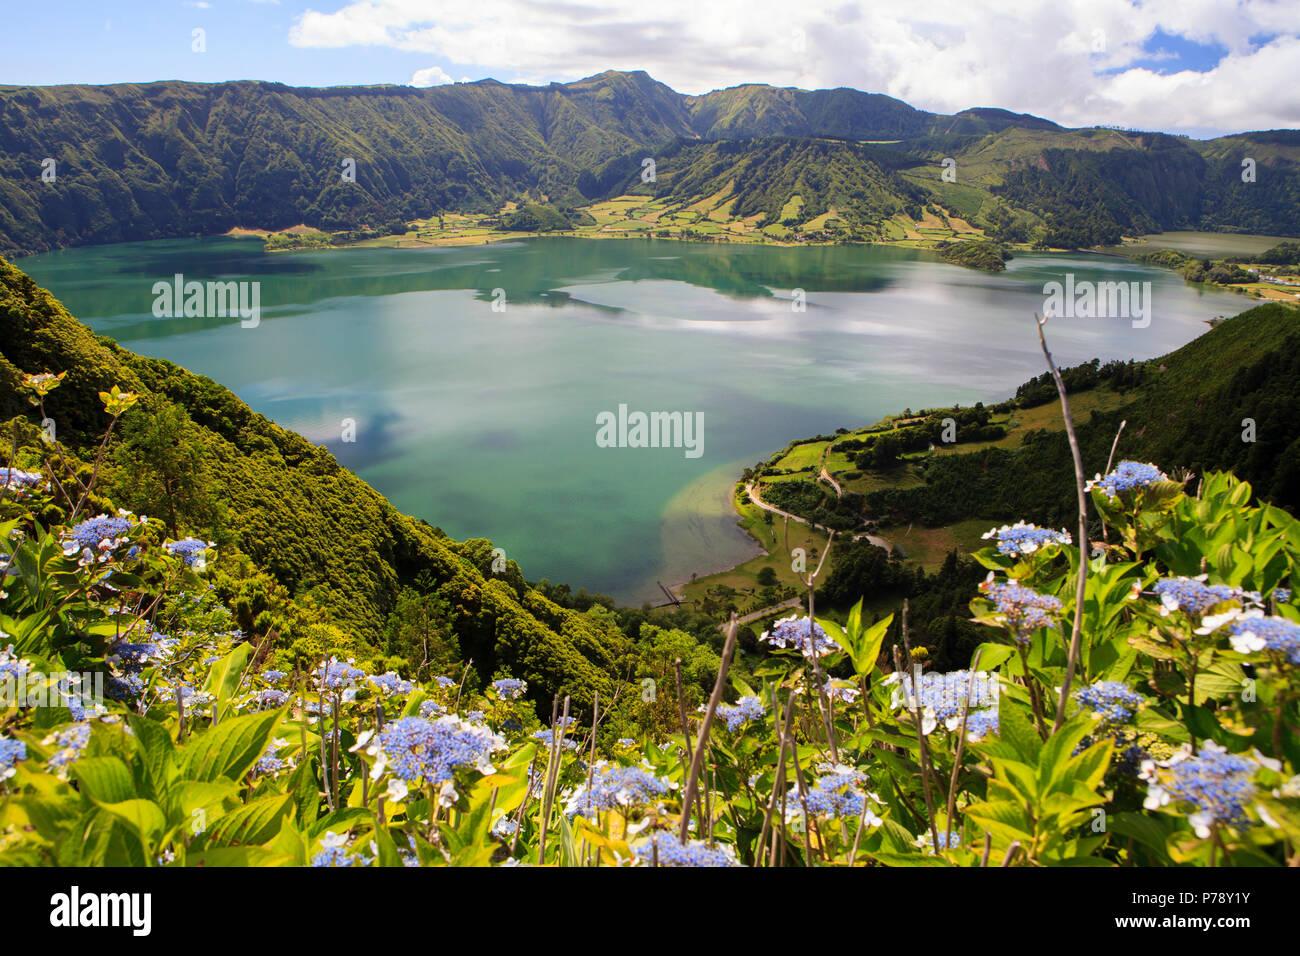 Lagoa das Sete Cidades, twin lakes in Sao Miguel, Azores - Stock Image